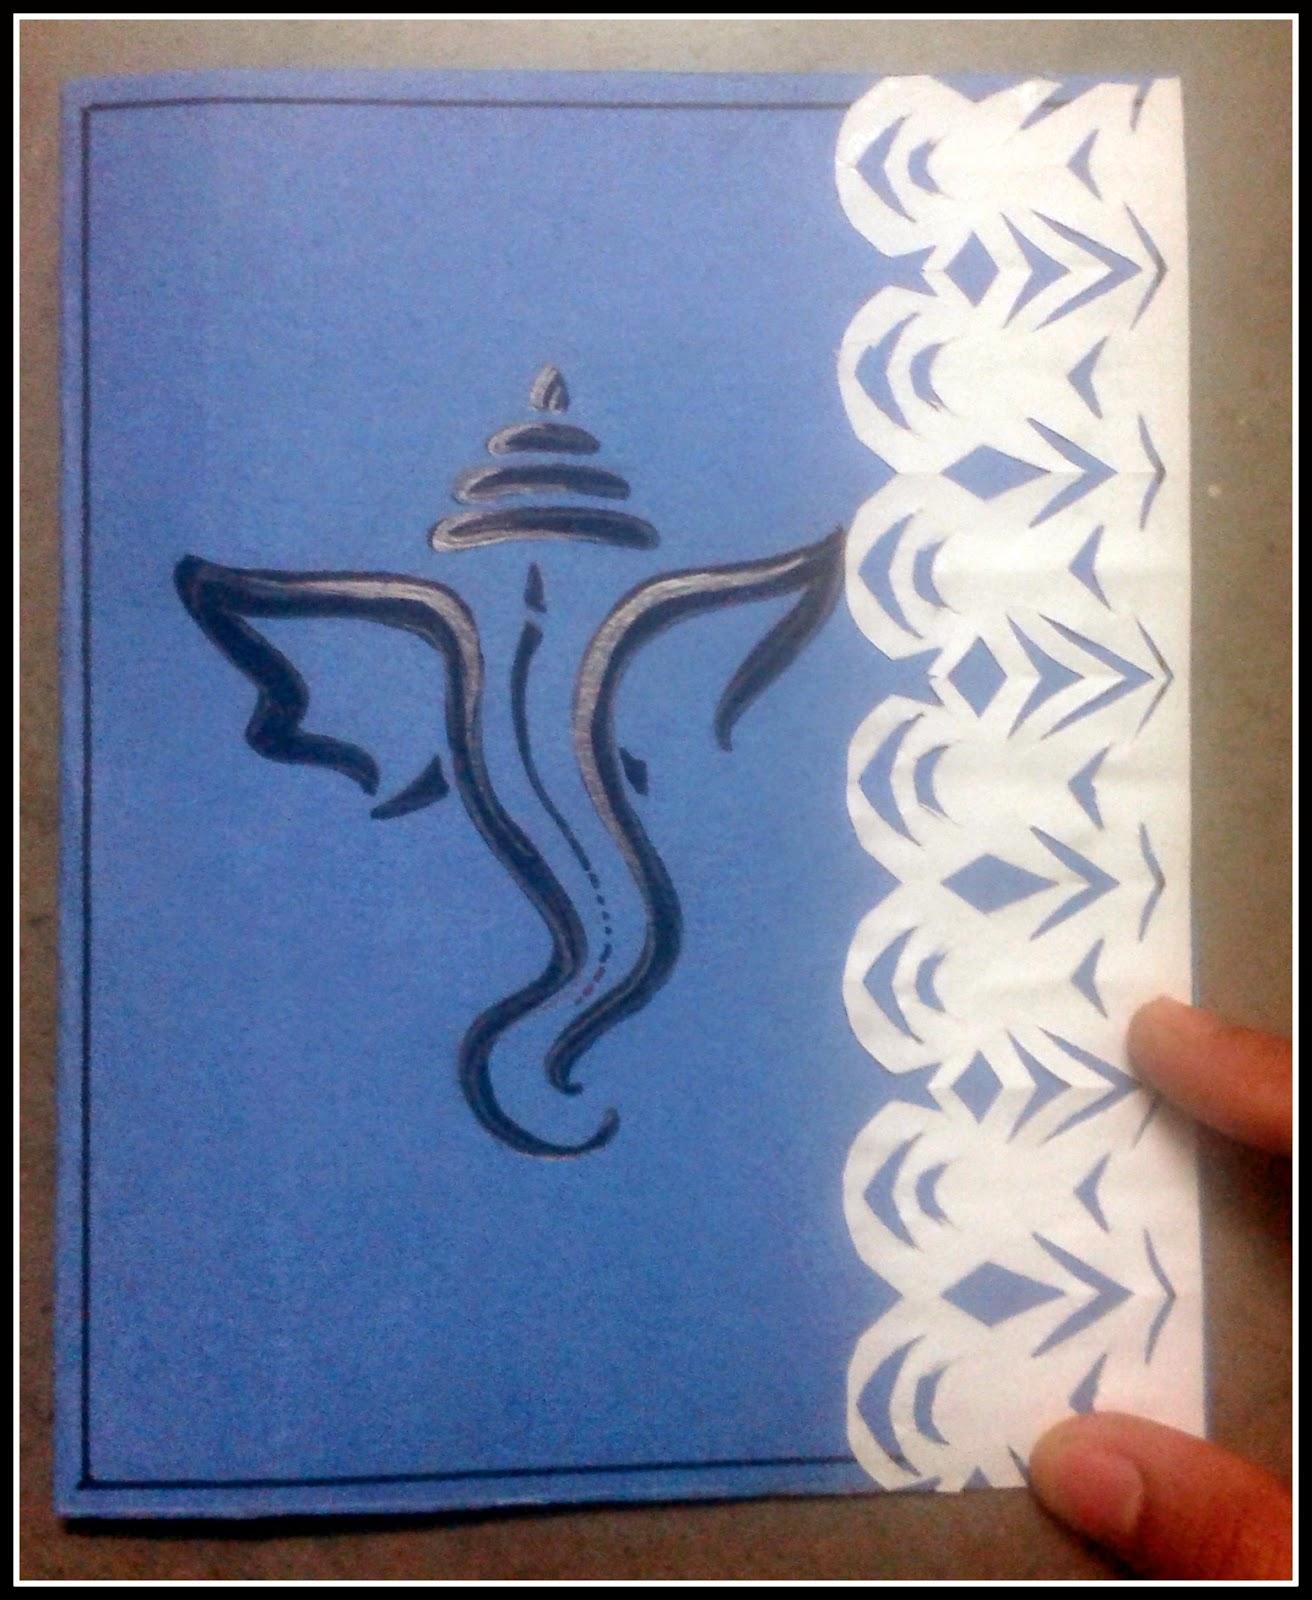 Handmade Ganesh Chaturthi Greeting Card Thestar